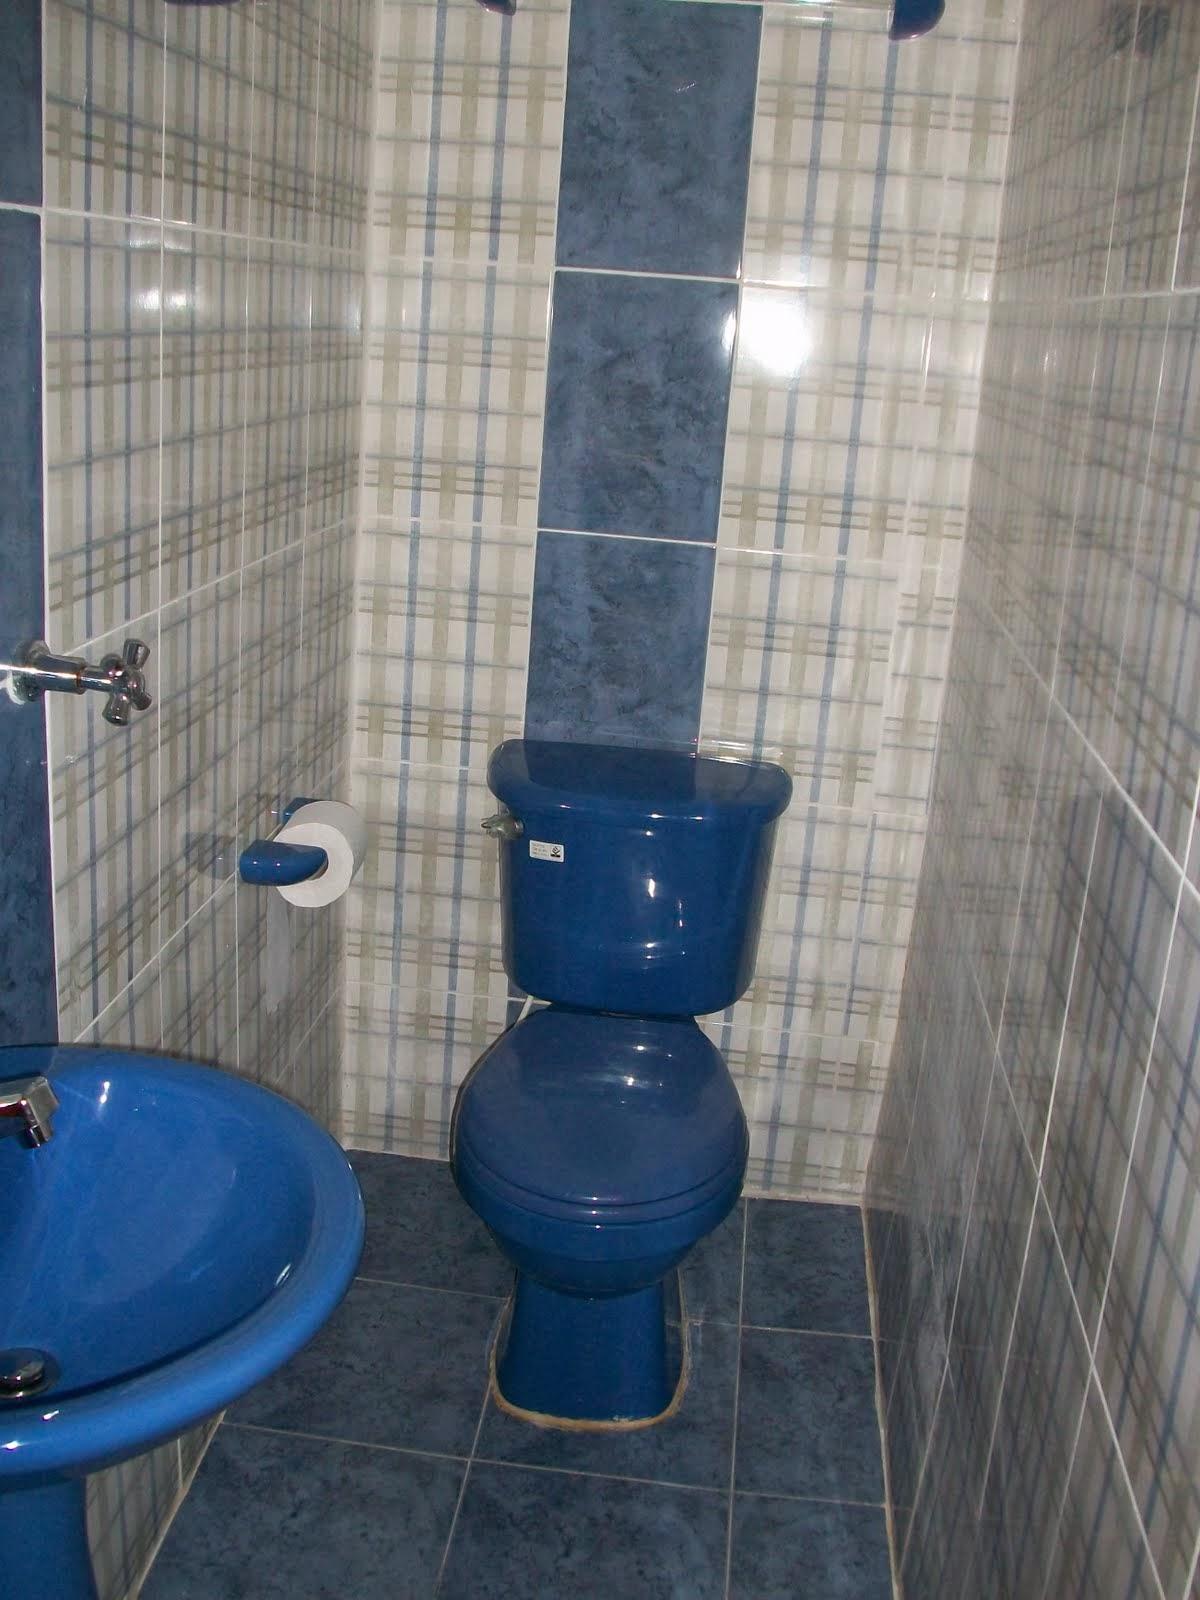 Baños Con Azulejos Azules:Decoracion Actual de moda: Baños en distintos tonos de Azul